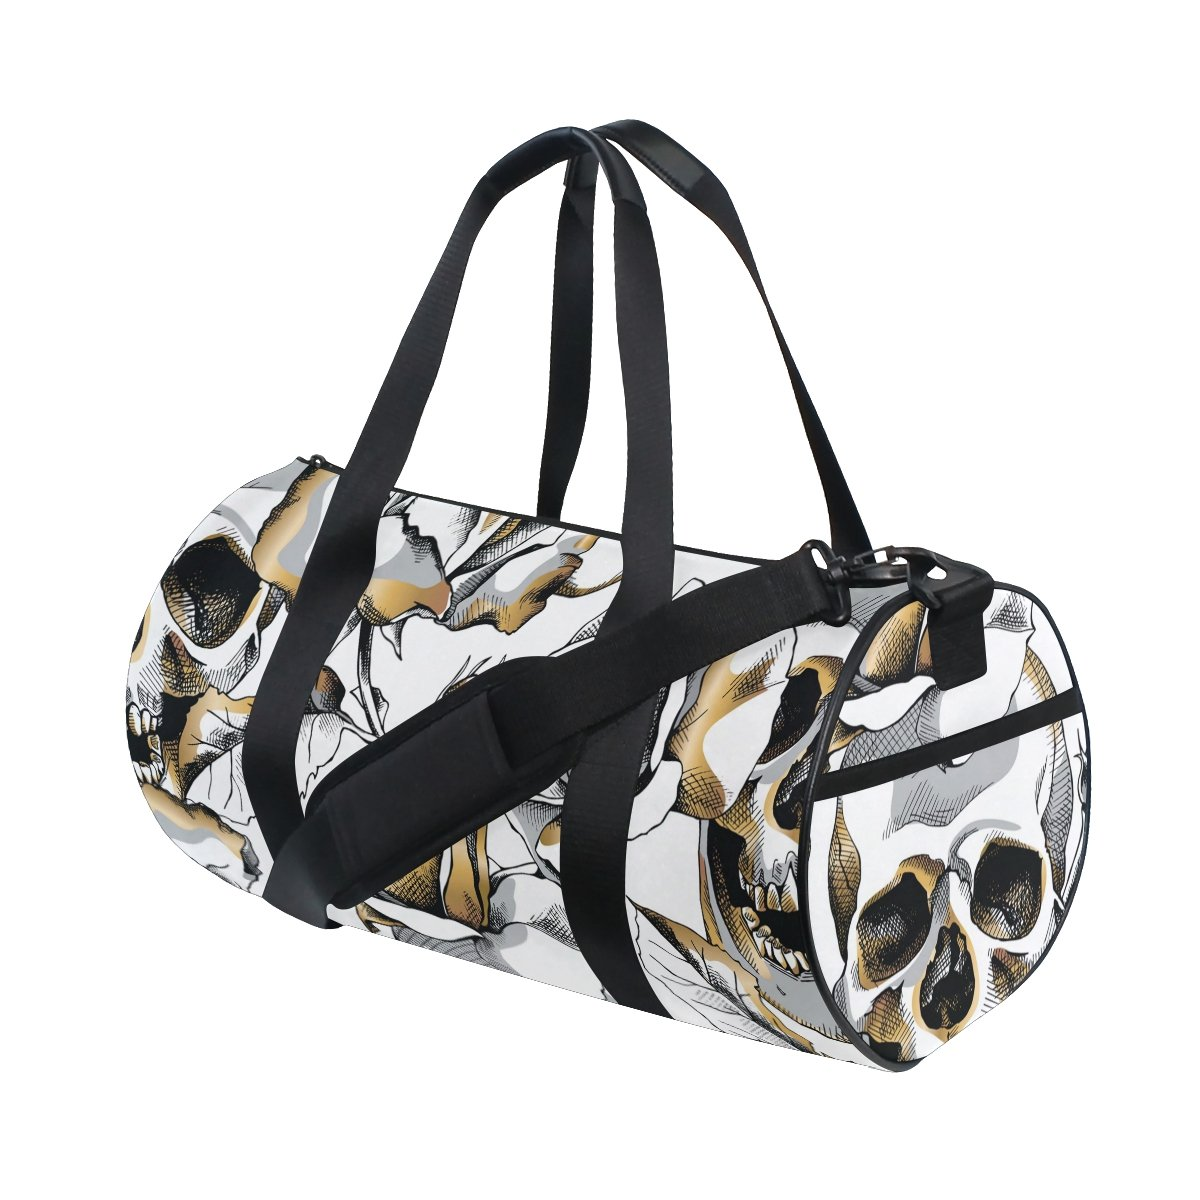 Naanle Gold Skull And Rose Flower Day Of The Dead Gym bag Sports Travel Duffle Bags for Men Women Boys Girls Kids